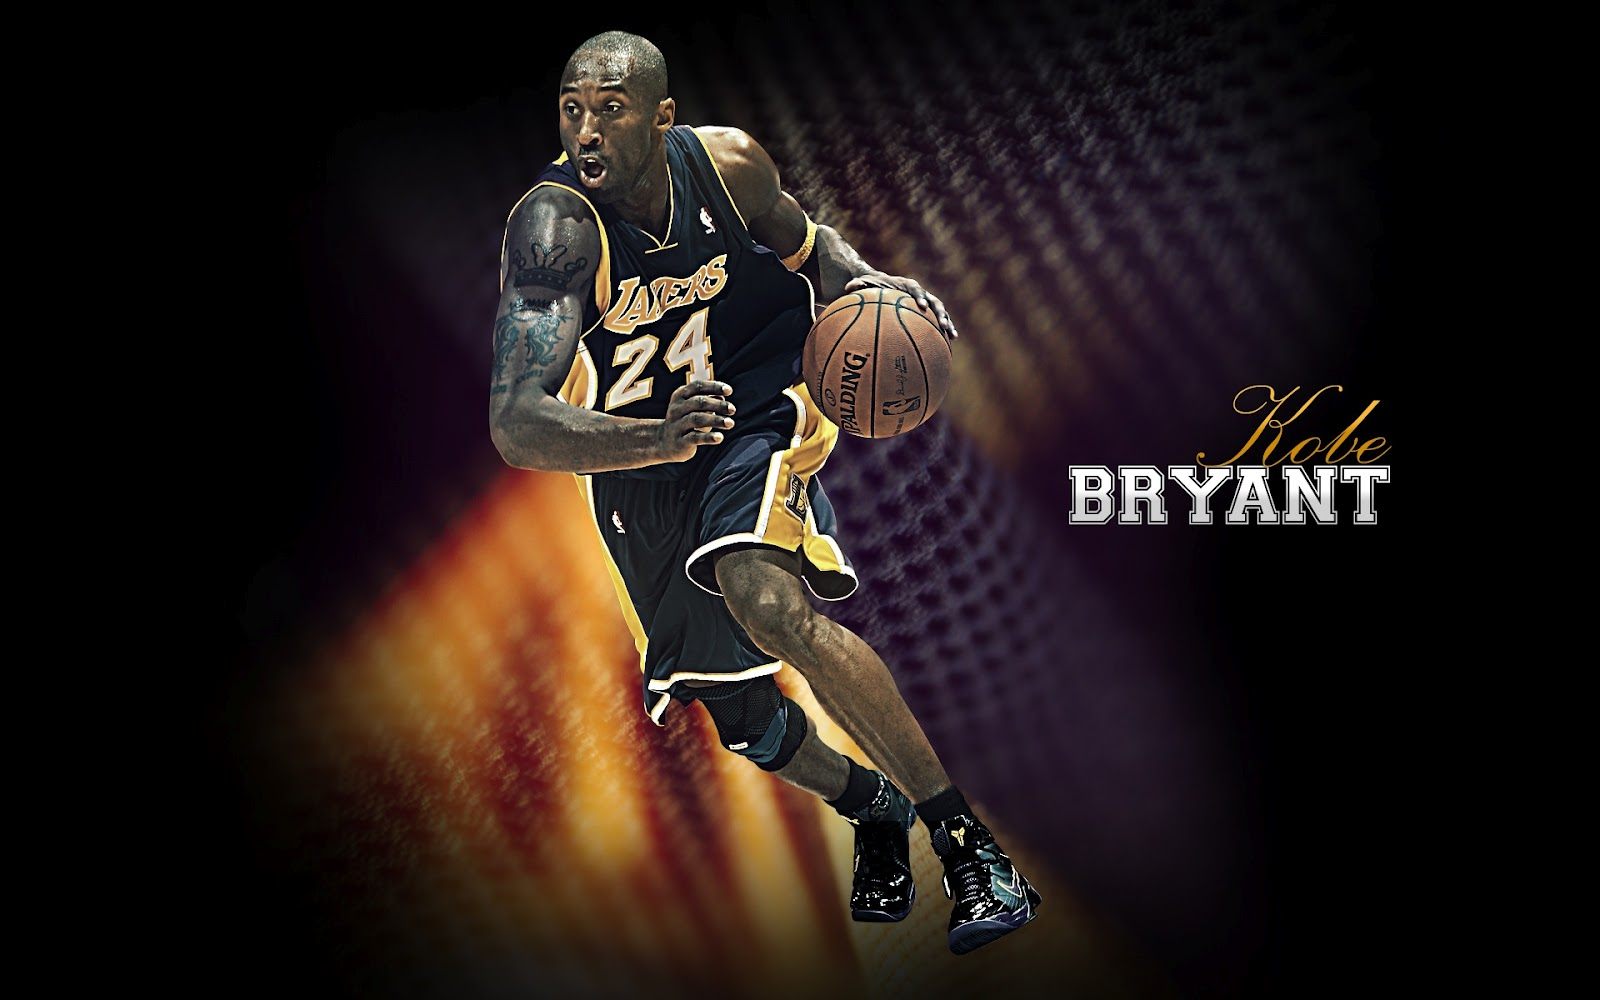 Best Kobe Bryant Wallpapers: Kobe Bryant New HD Wallpapers 2013